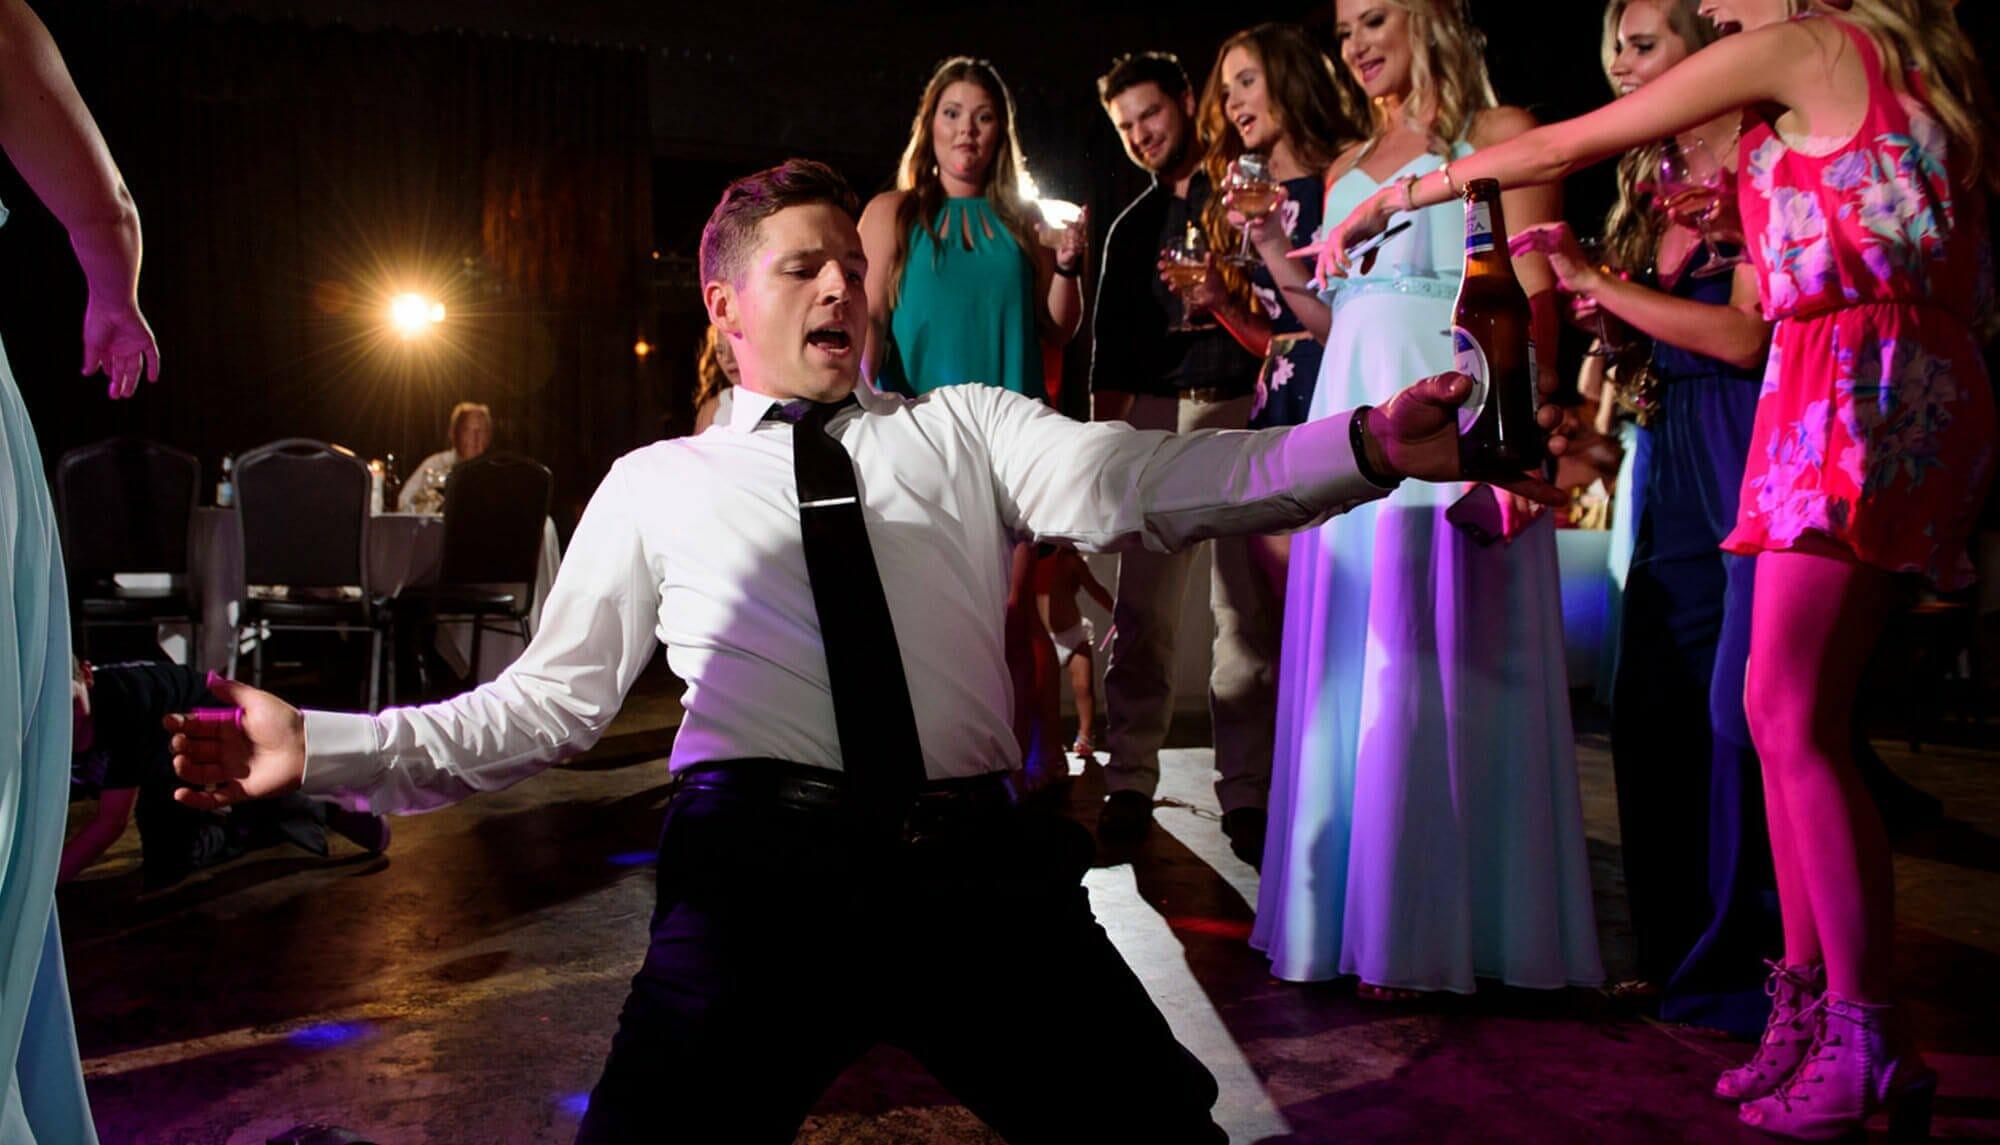 Wedding party reception photo northwest arkansas